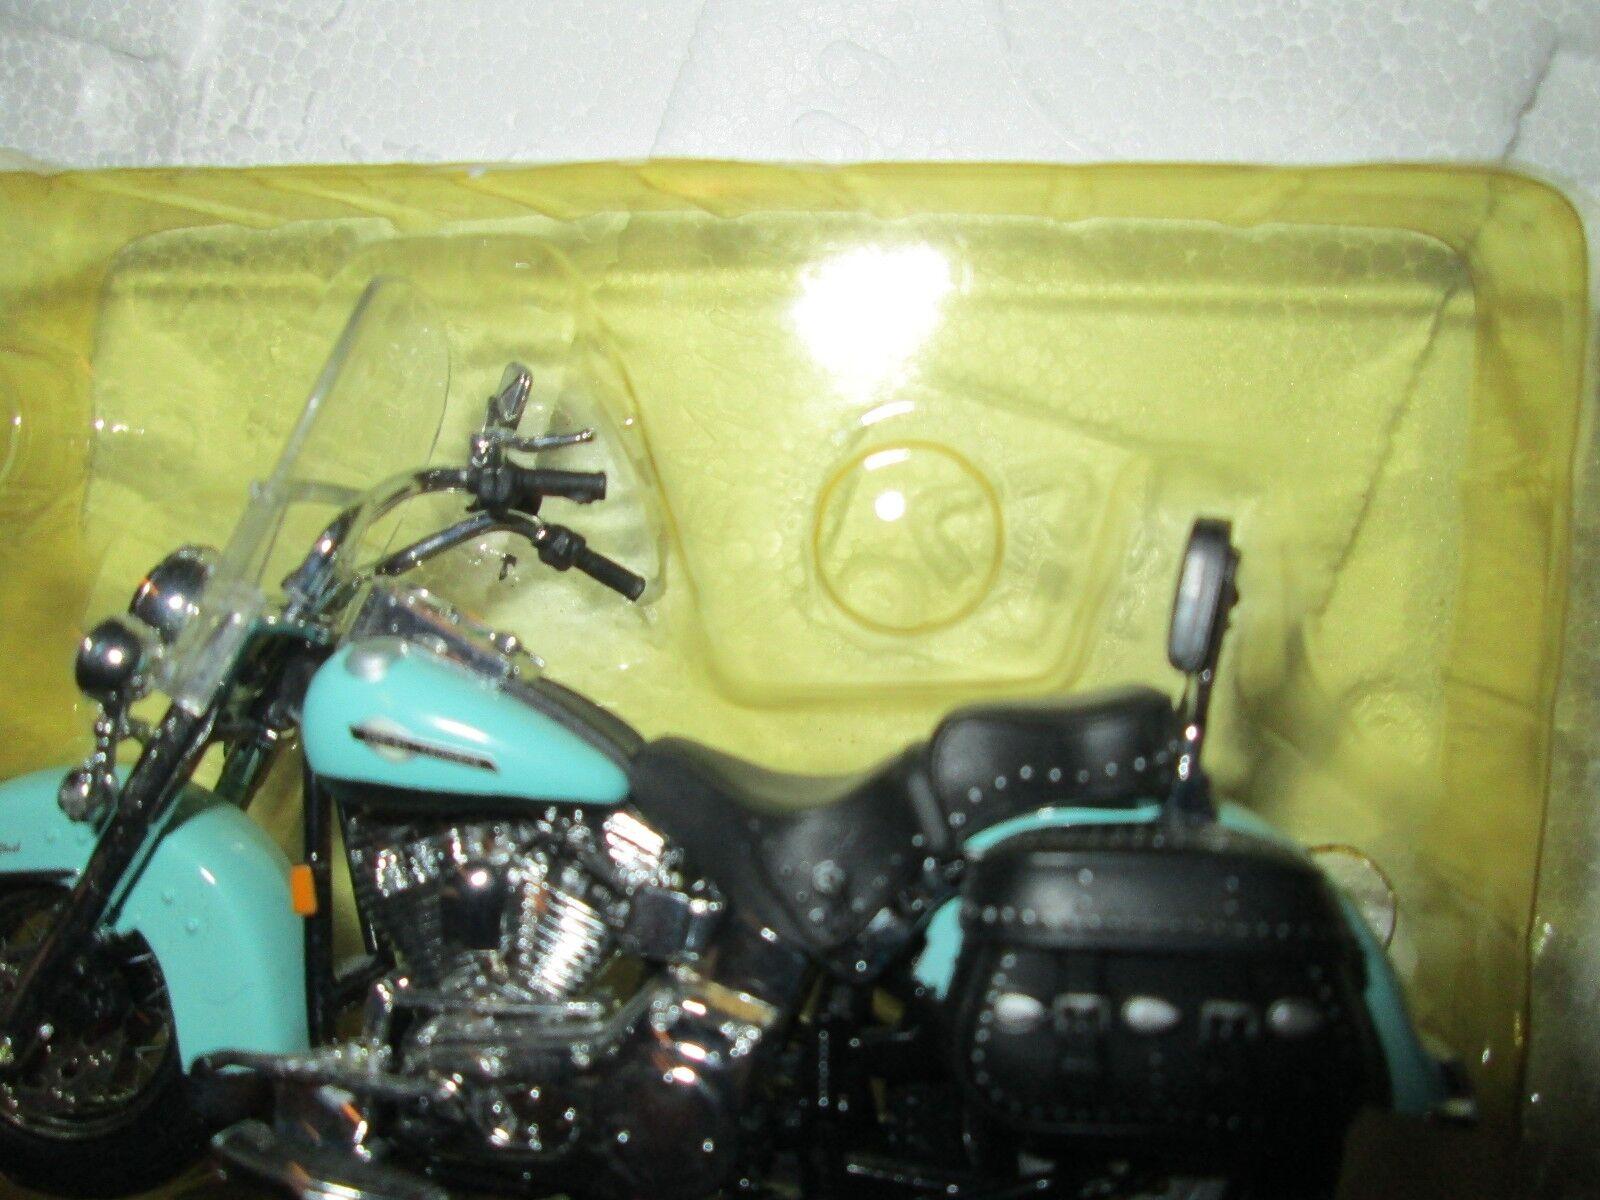 Harley Davidson CHEVY SUBURBAN W W W  MOTORCYCLE HERITAGE SOFTAIL 1 24 DAMAGED BIKE bc0468